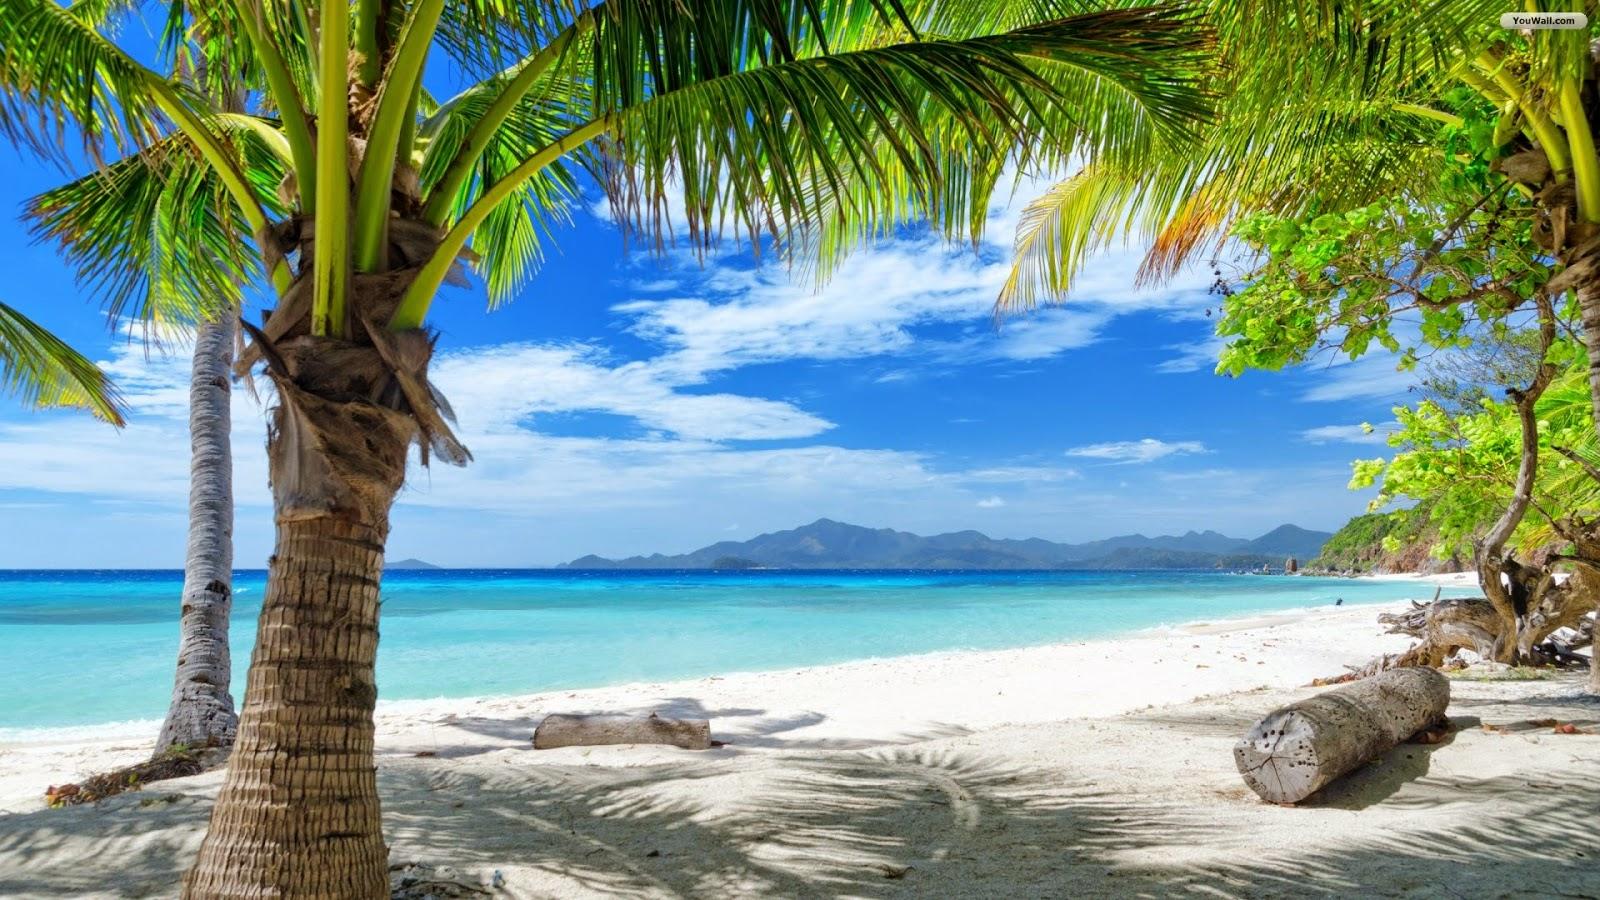 "<img src=""http://4.bp.blogspot.com/-EpGdZfOeCqk/VDP79_Hwf3I/AAAAAAAAA7s/UVtgS0IXUq0/s1600/paradise.jpg"" alt=""Top 10 Best Beaches in the World that are Very Beautiful"" />"